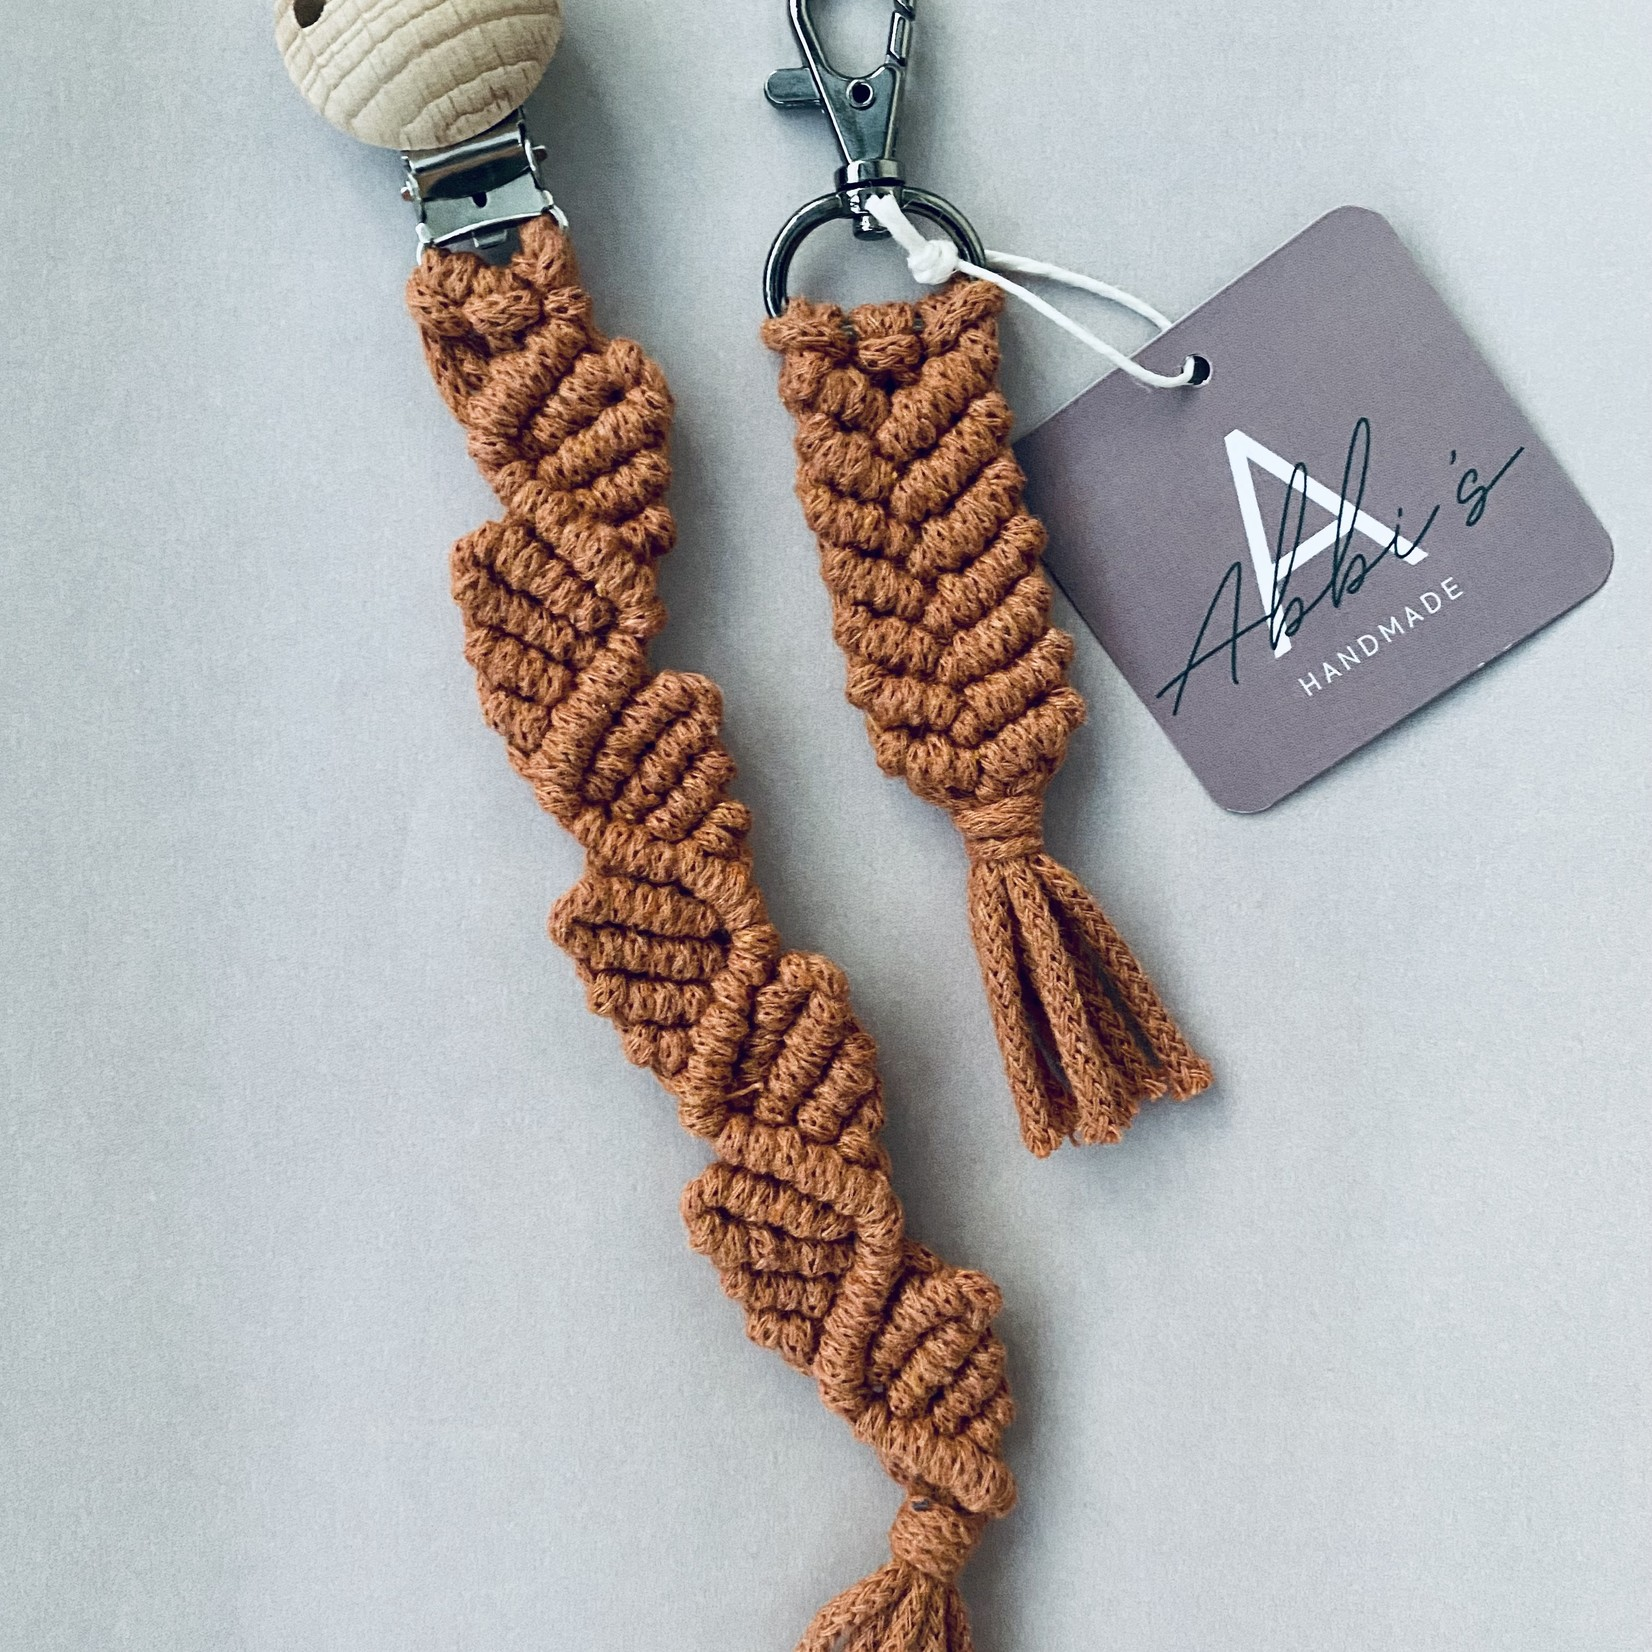 Abbi's Handmade Macramé Giftset - Terracotta